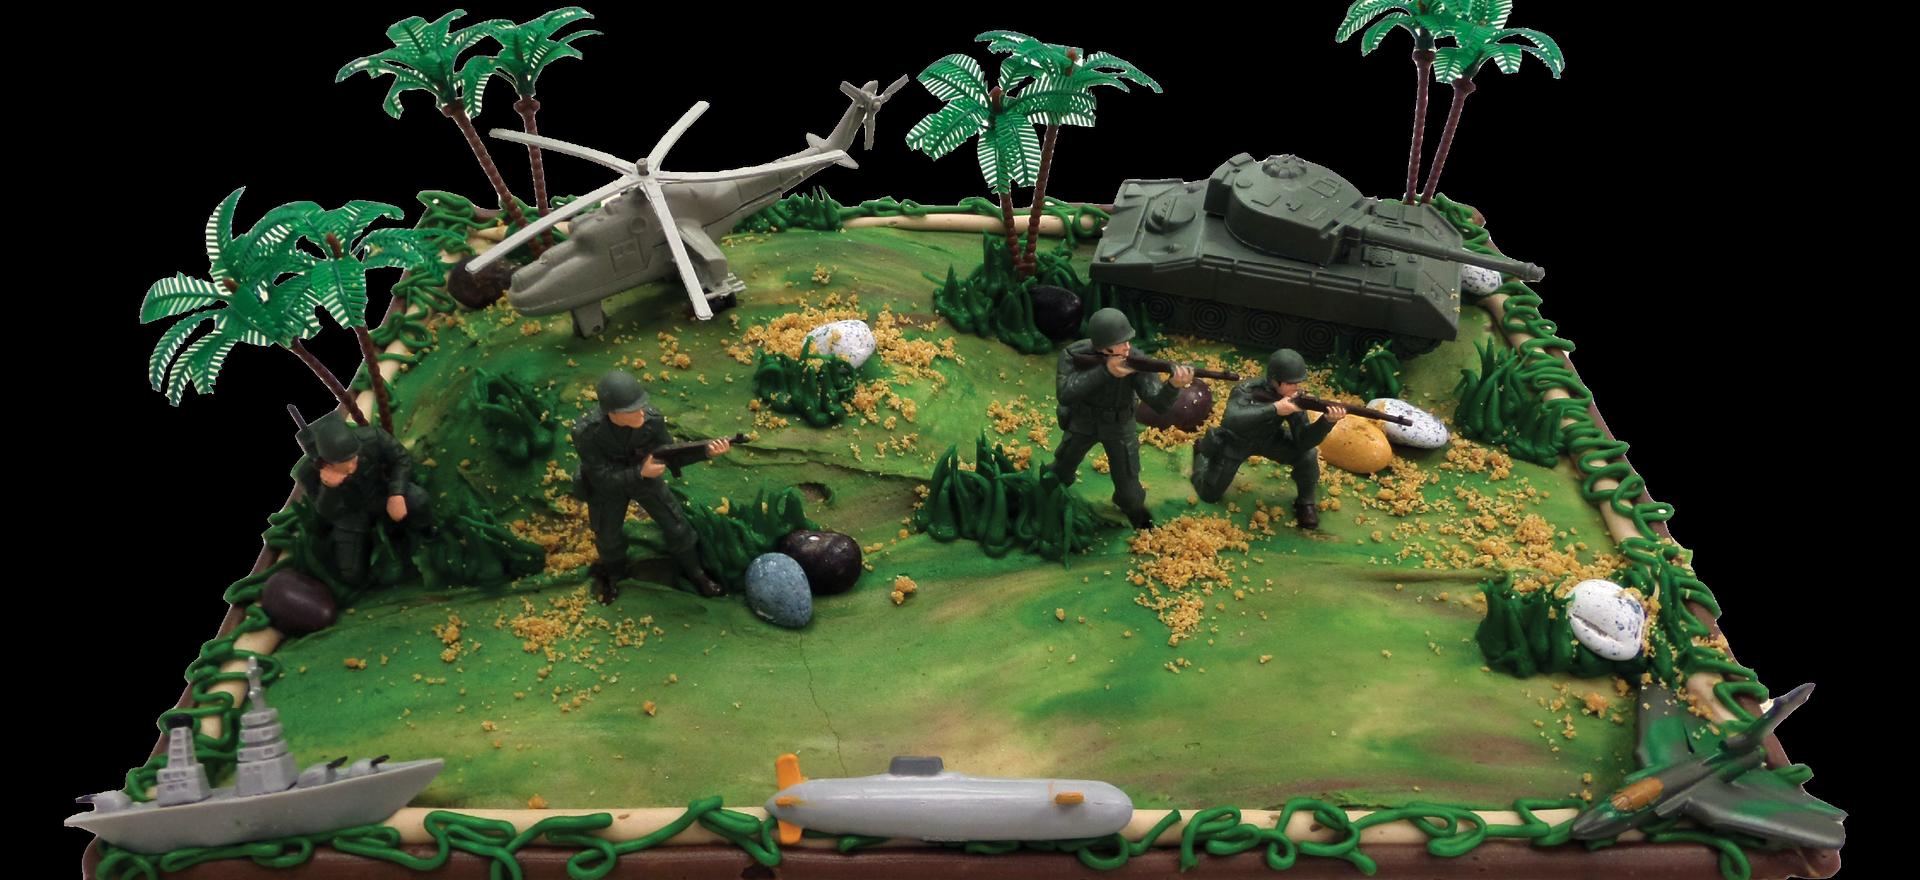 Army Scene